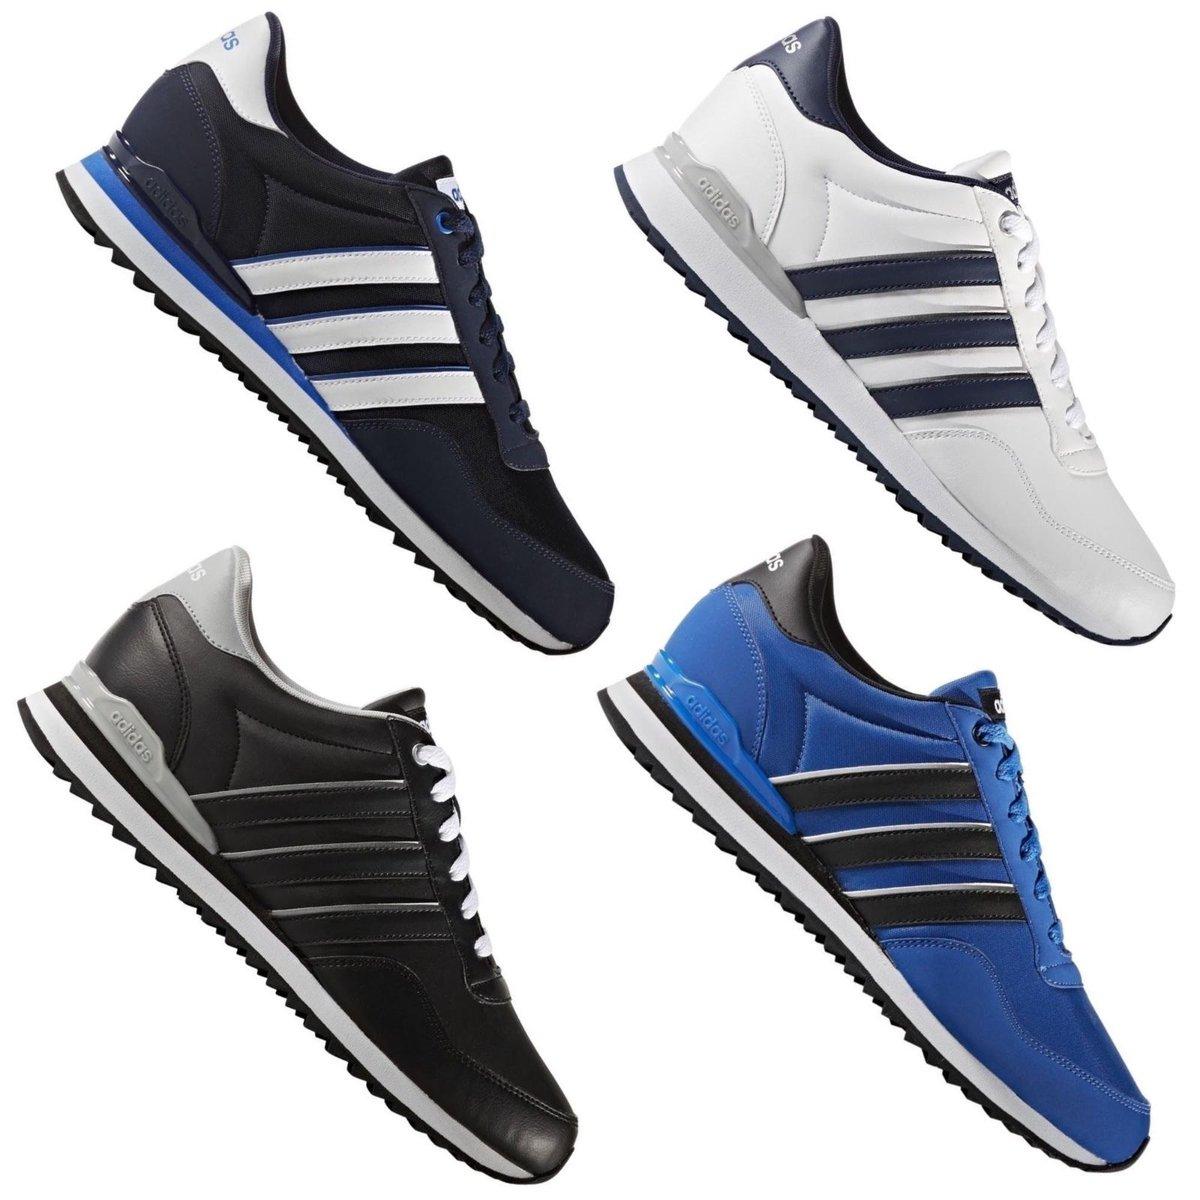 Herren On Neo Schuhe Adidas Hashtag Twitter tQrhdCxs